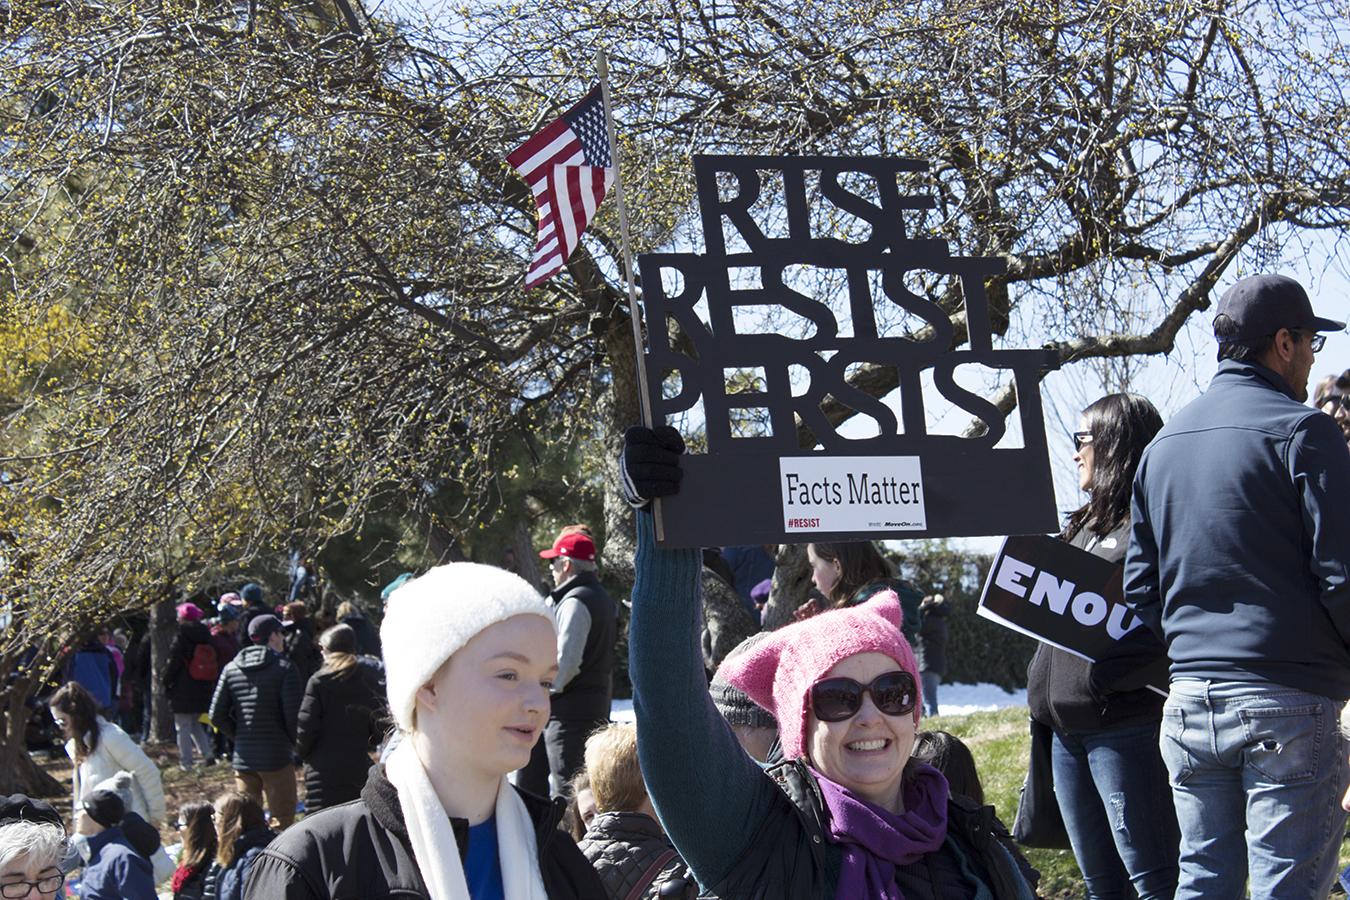 Hilary_Lam_Hugs_not_guns_protestor_philadelphia_Rise_Resist_Persist